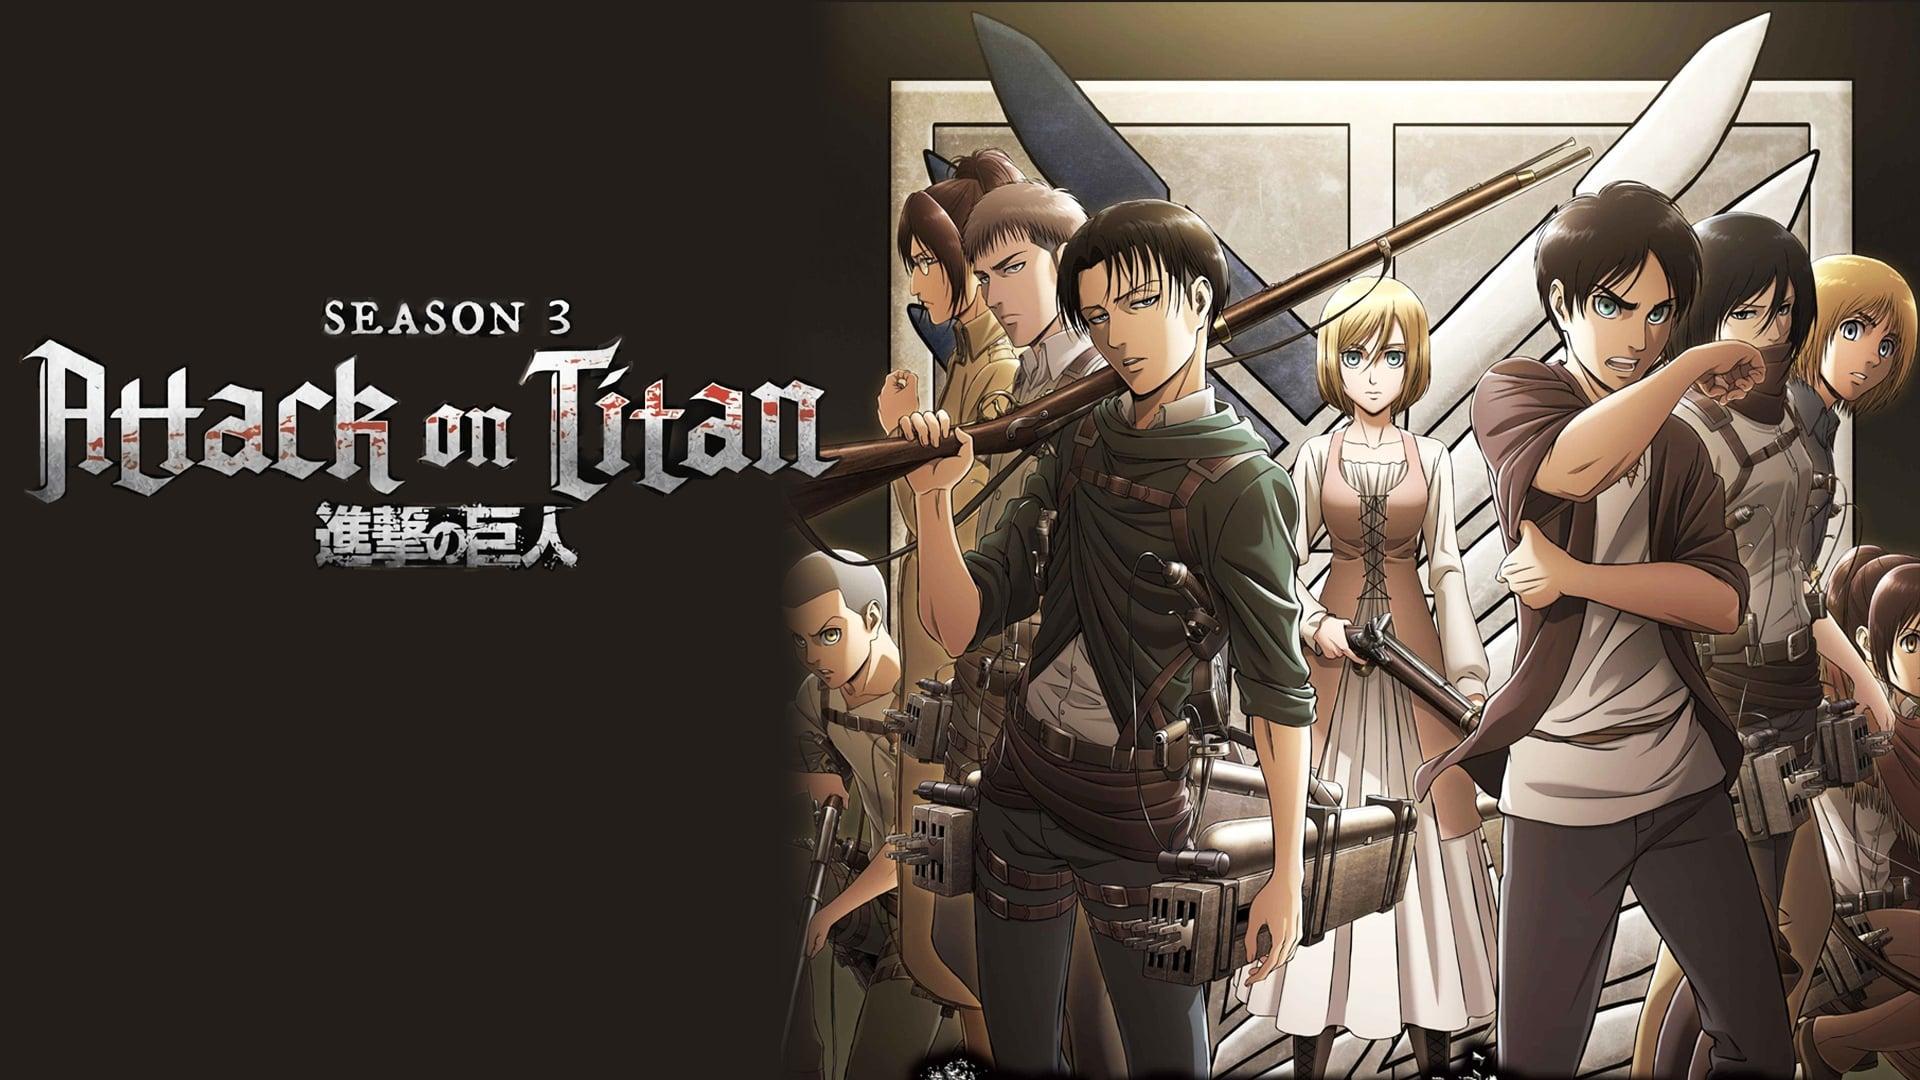 Attack on Titan - Season 1